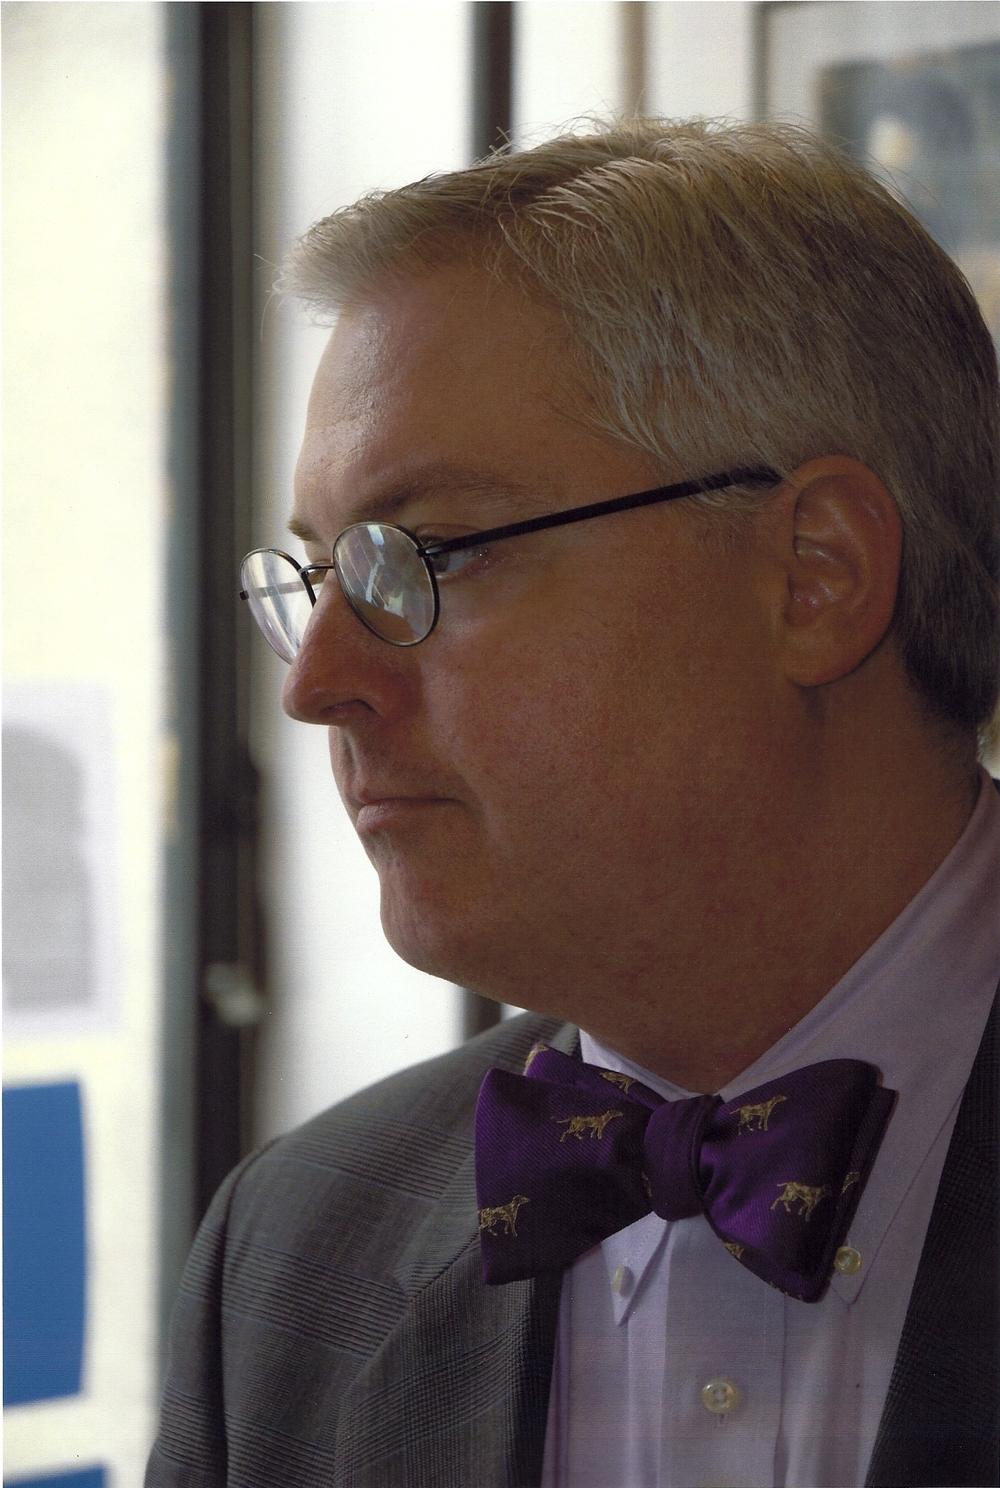 Daniel Wuenschel with Purple Tie-2.JPG